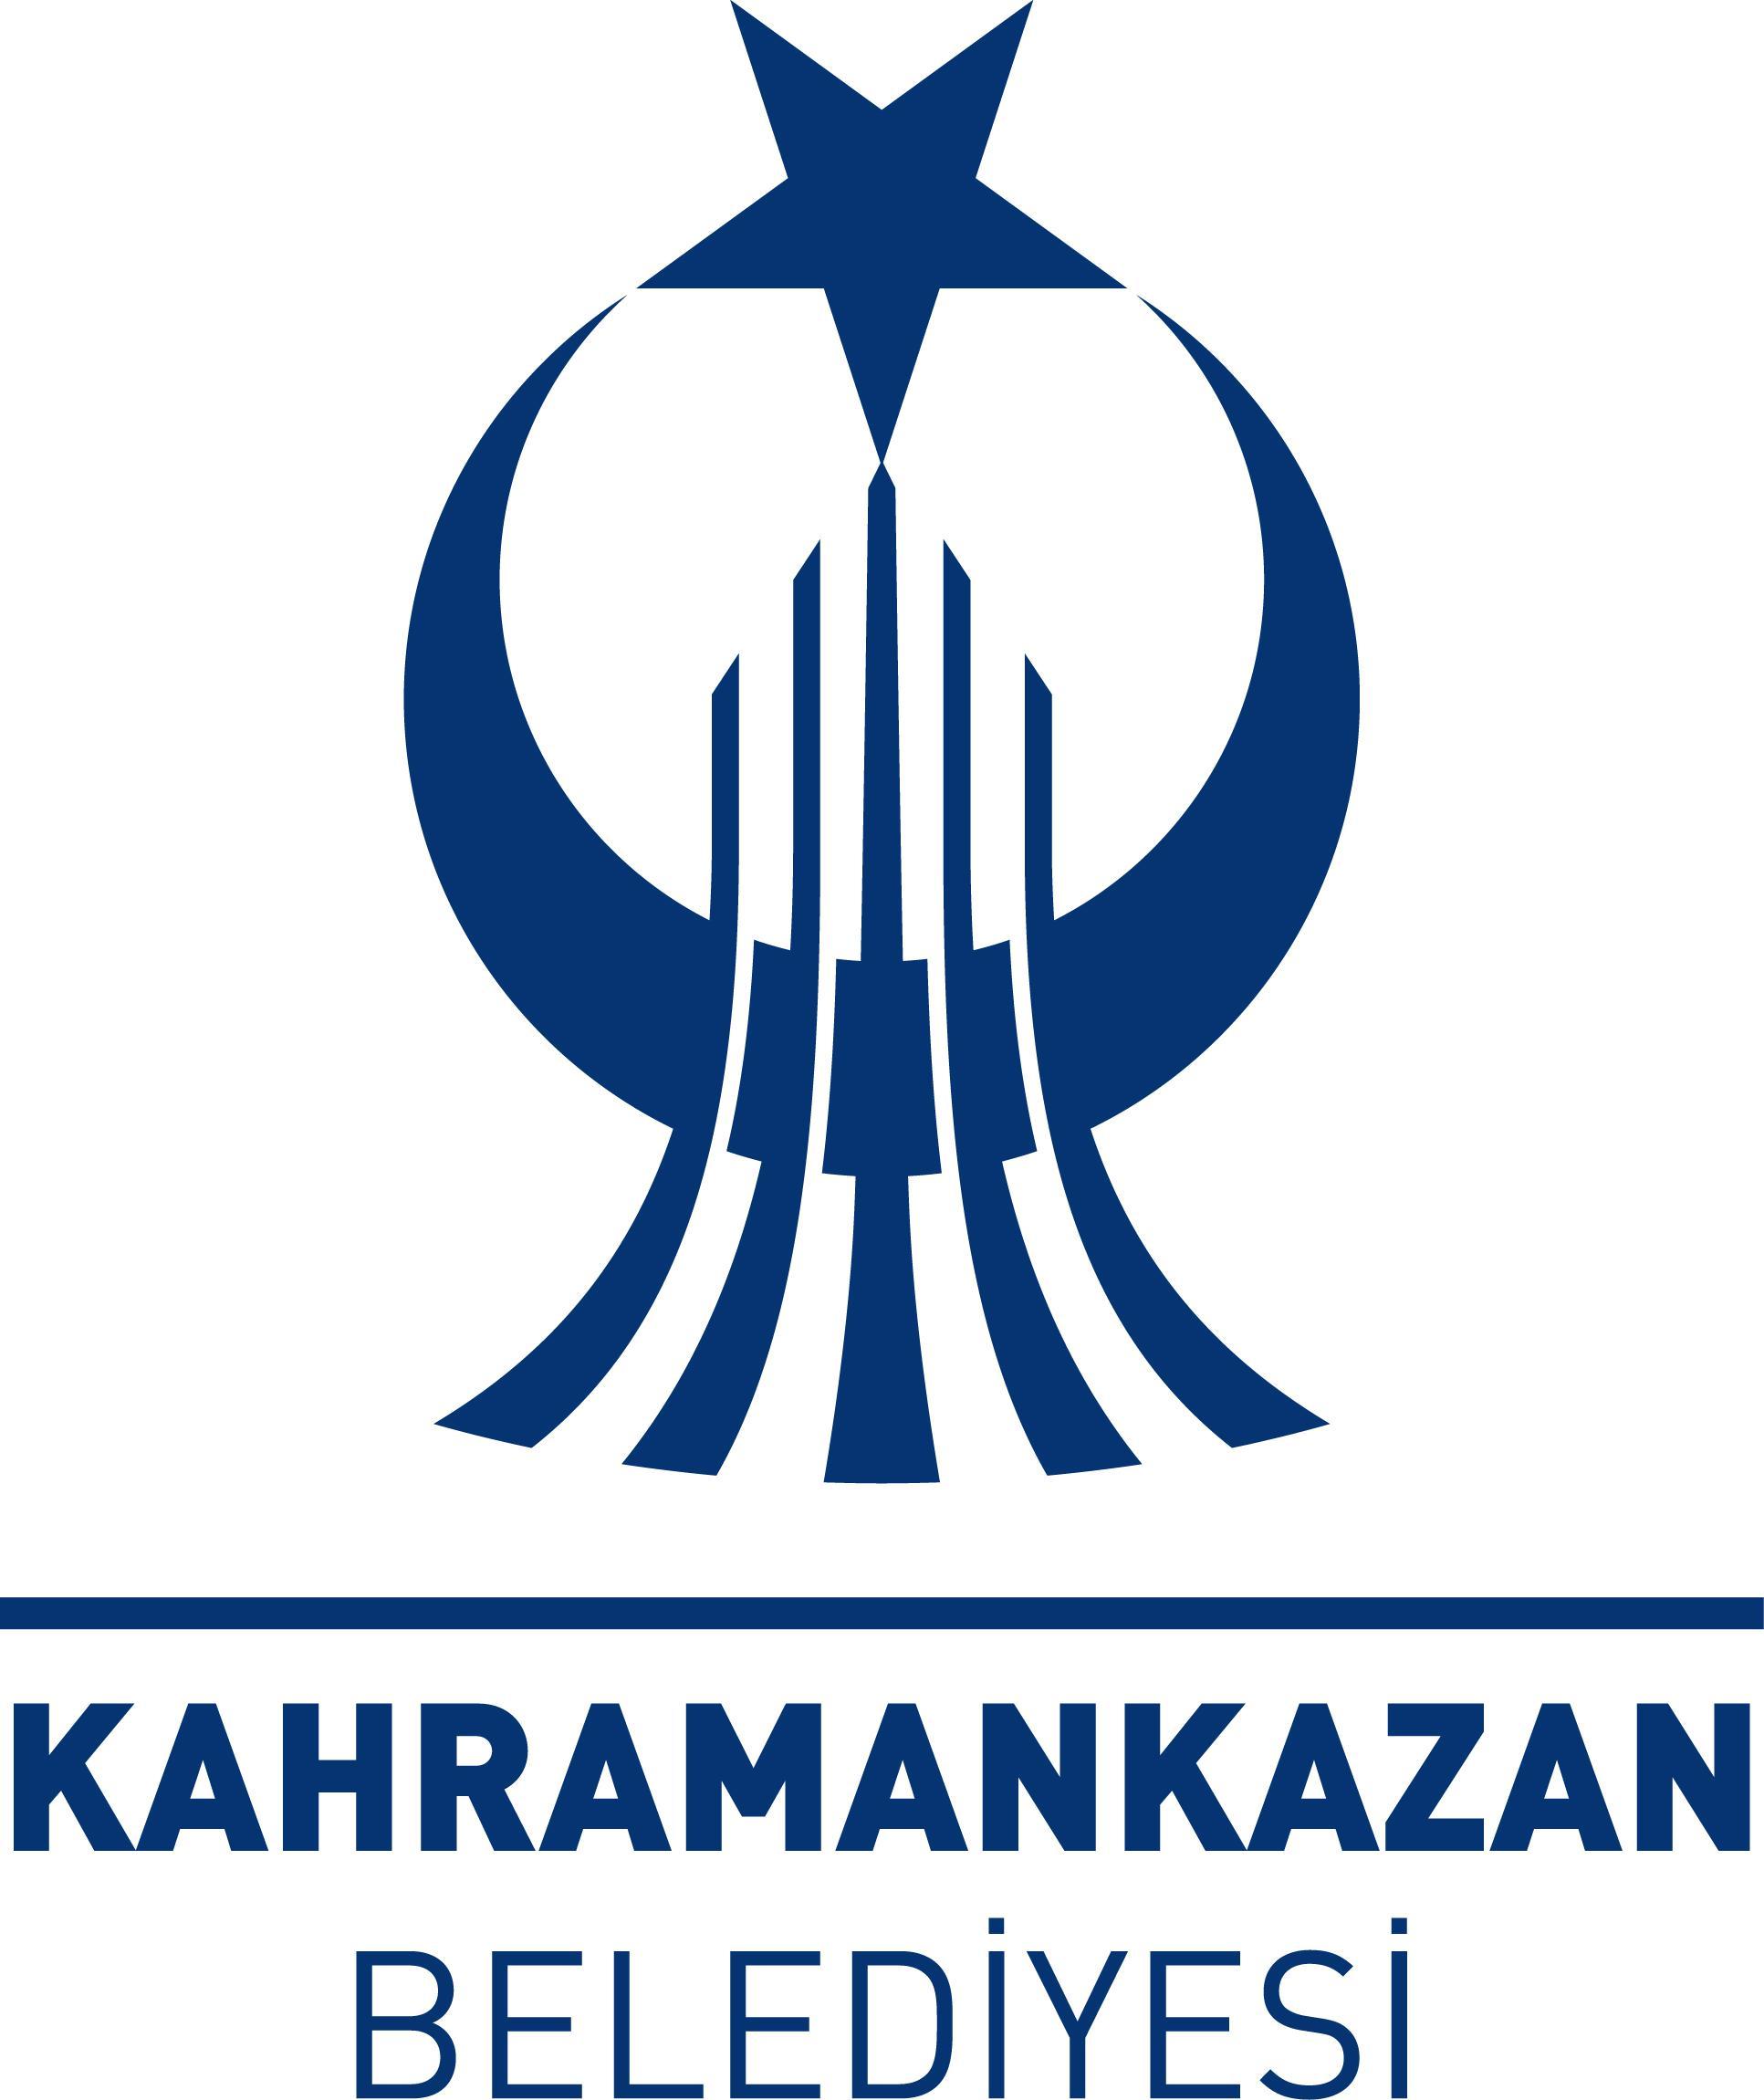 Kahraman kazan logo